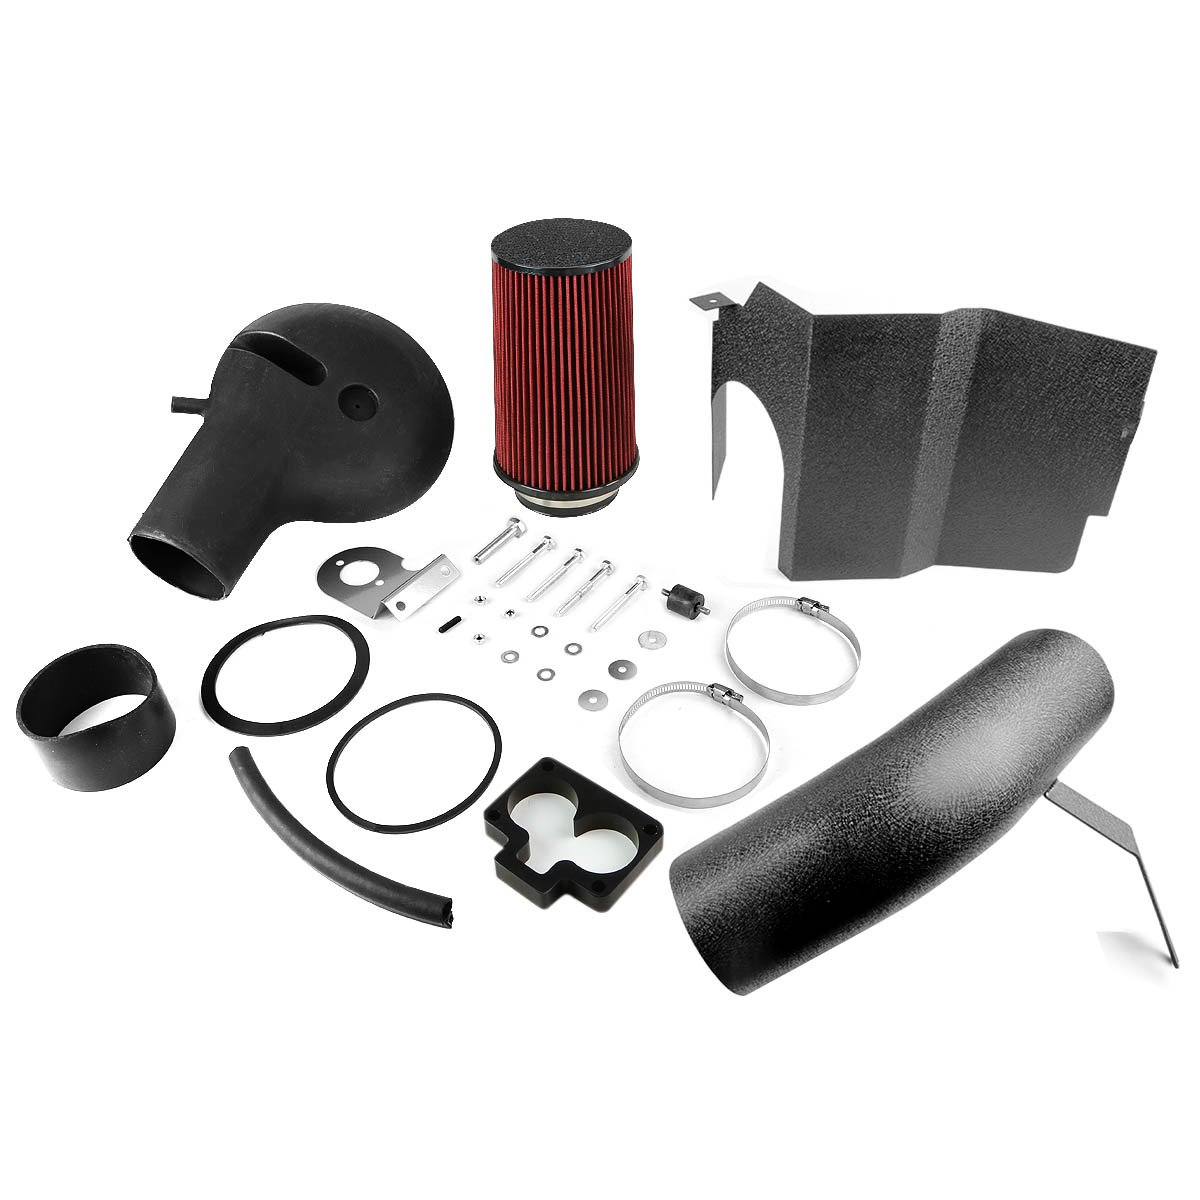 For 97-99 Dodge Dakota Durango V8 DNA Motoring AIP-2-HS-DAKOTA97V8-BKBK Cold Air Intake System w//Heat Shield